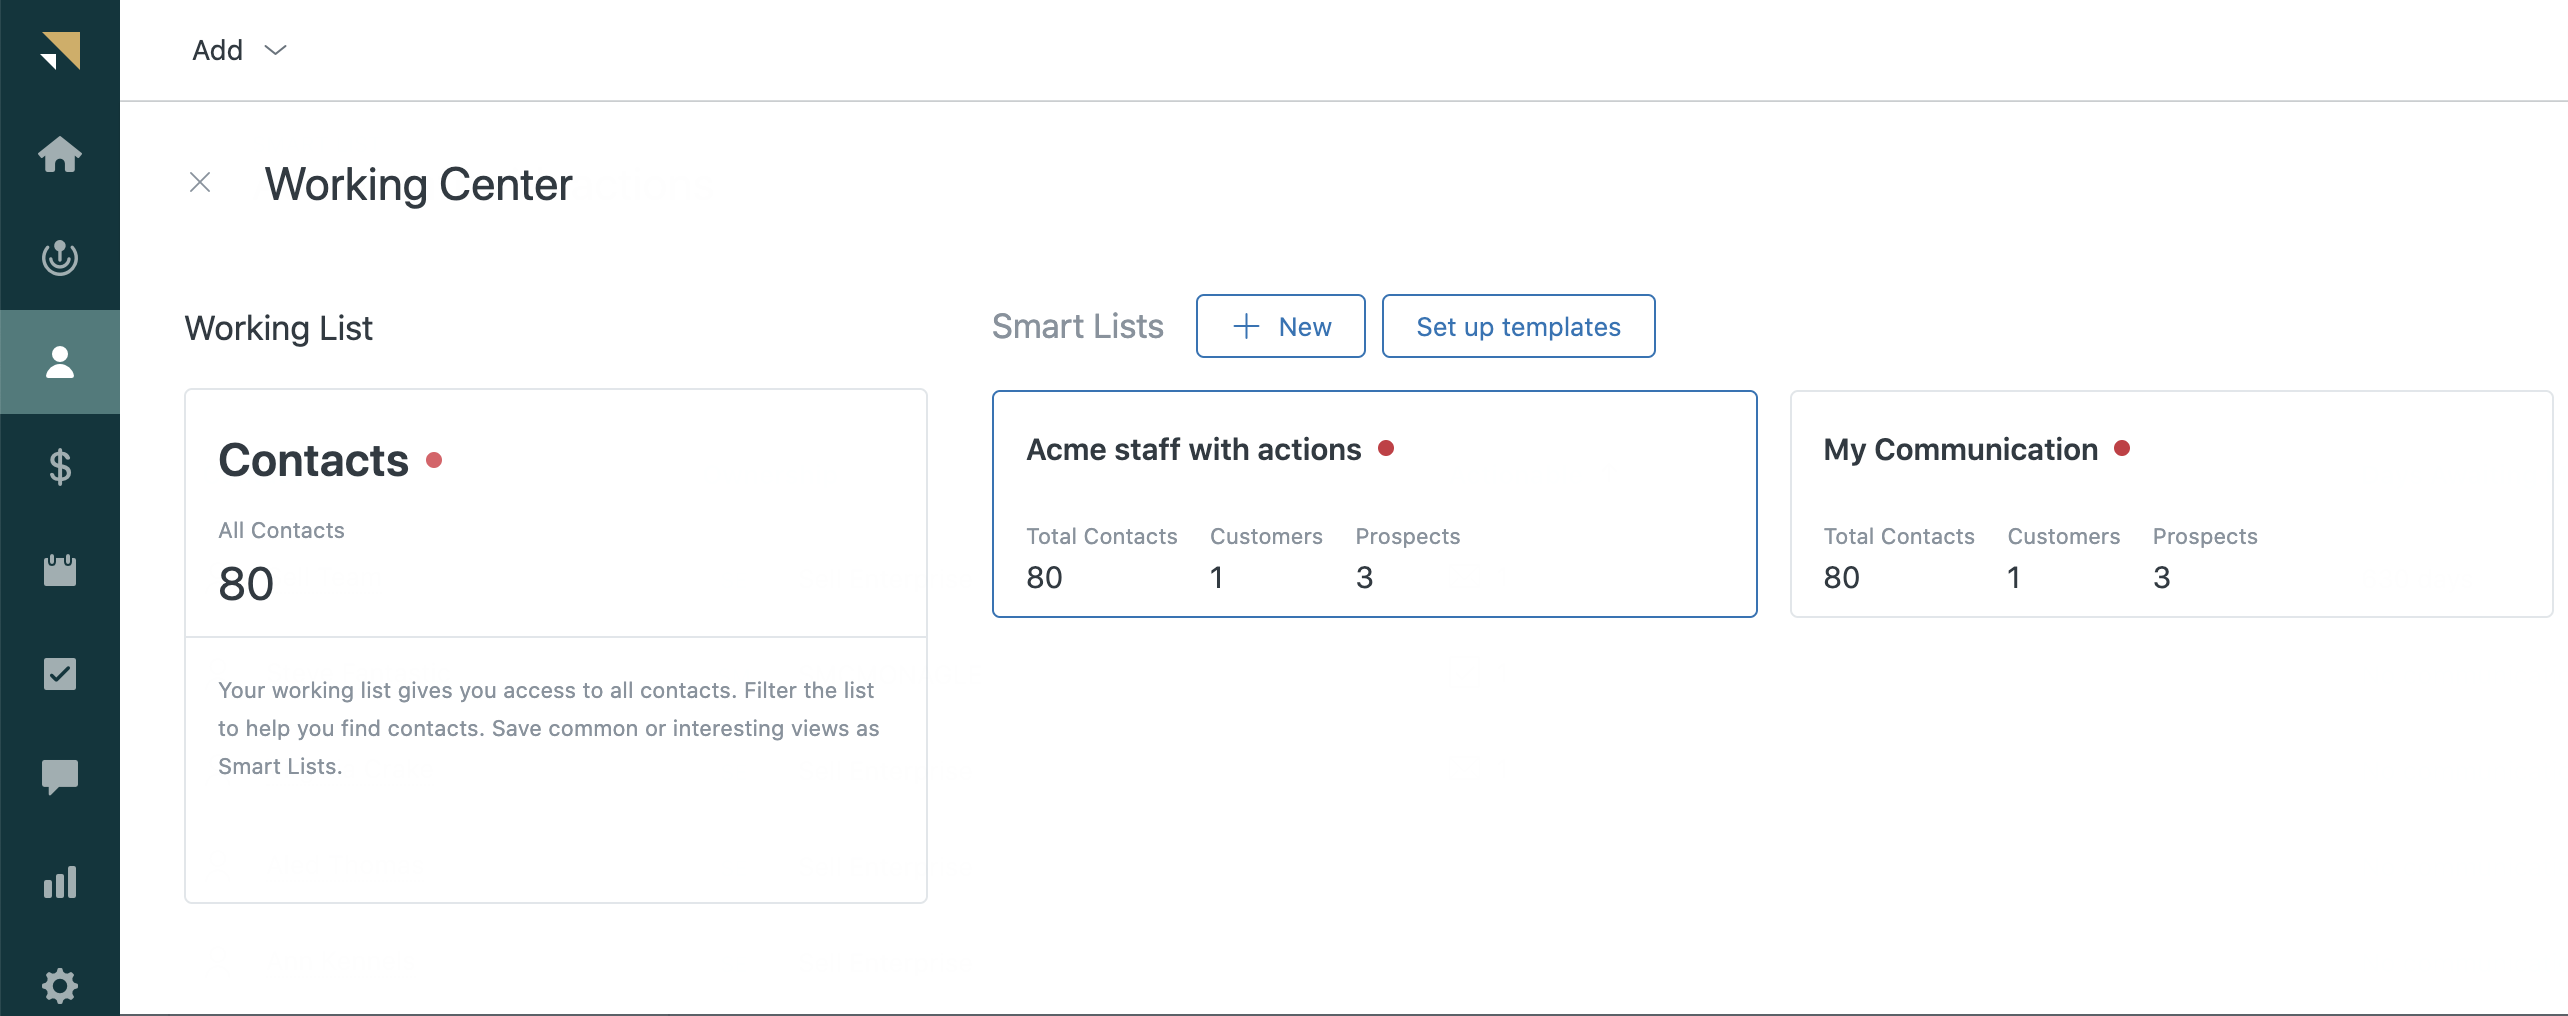 Sell – Smart Lists im Arbeitscenter